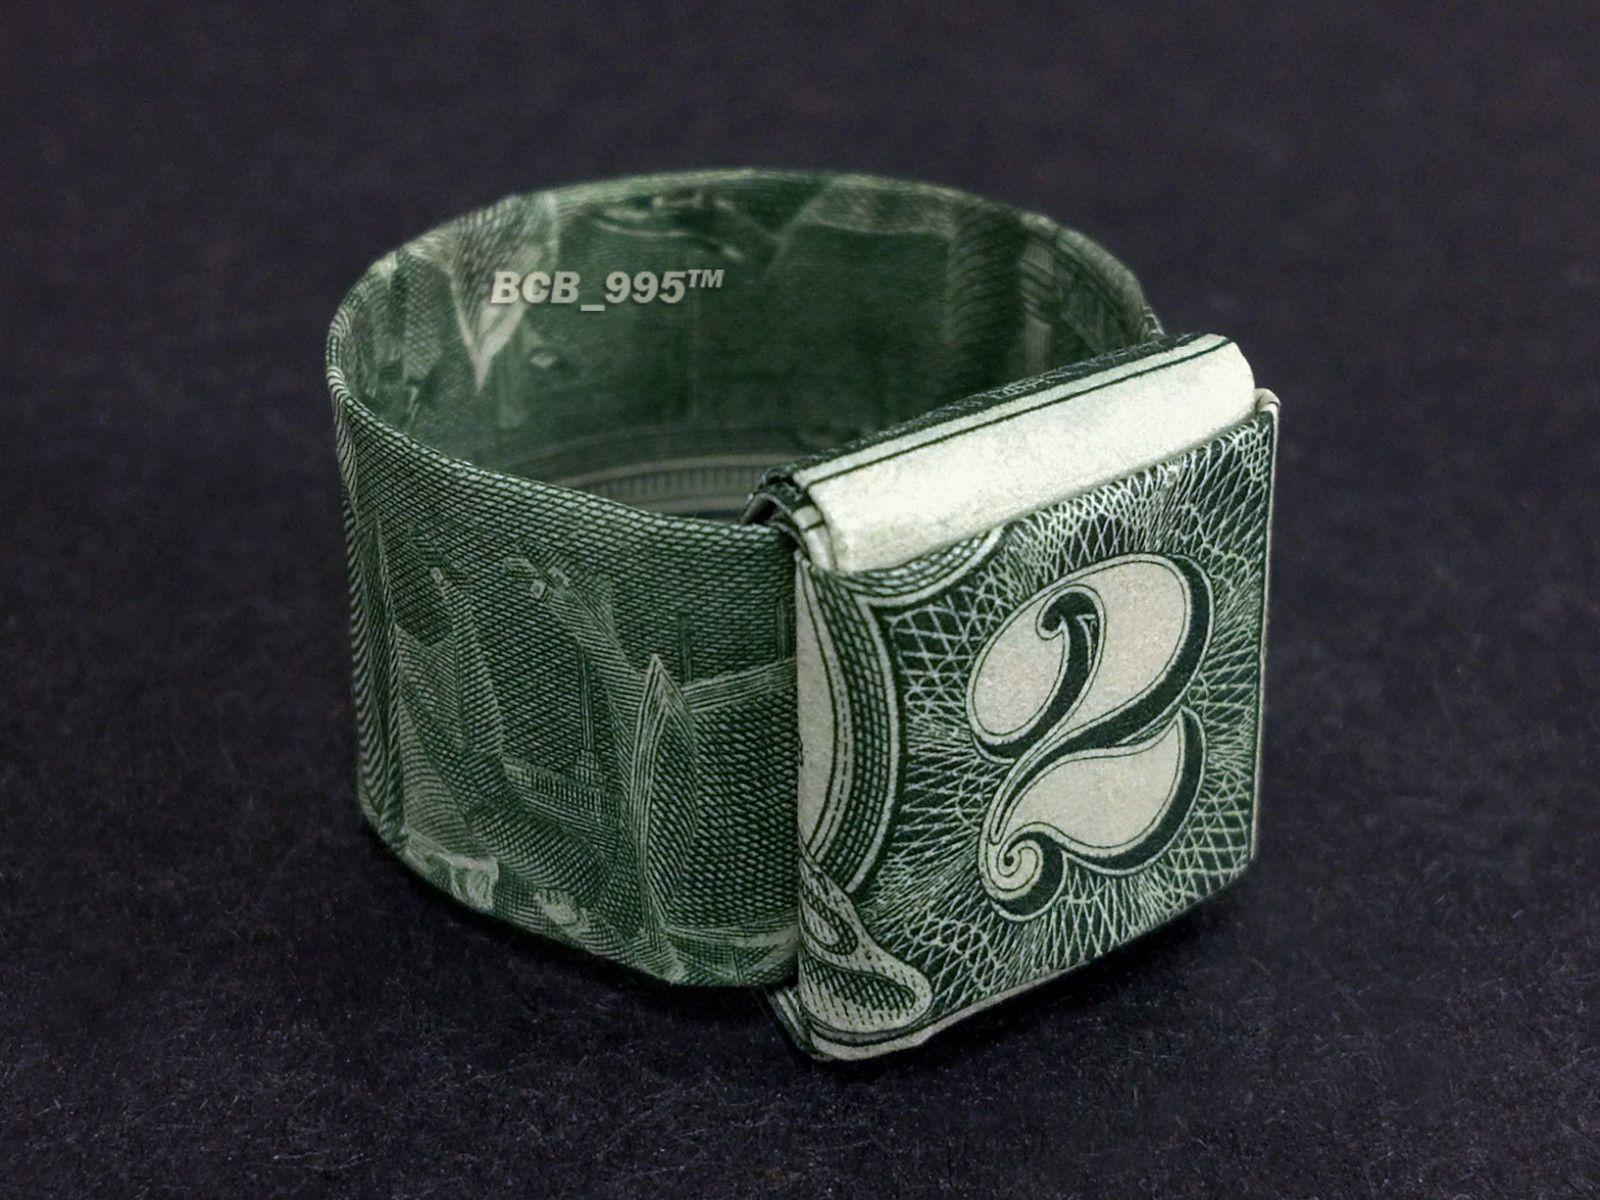 $2 Bill Origami Ring | Money Dollar Origami | Pinterest ... - photo#28